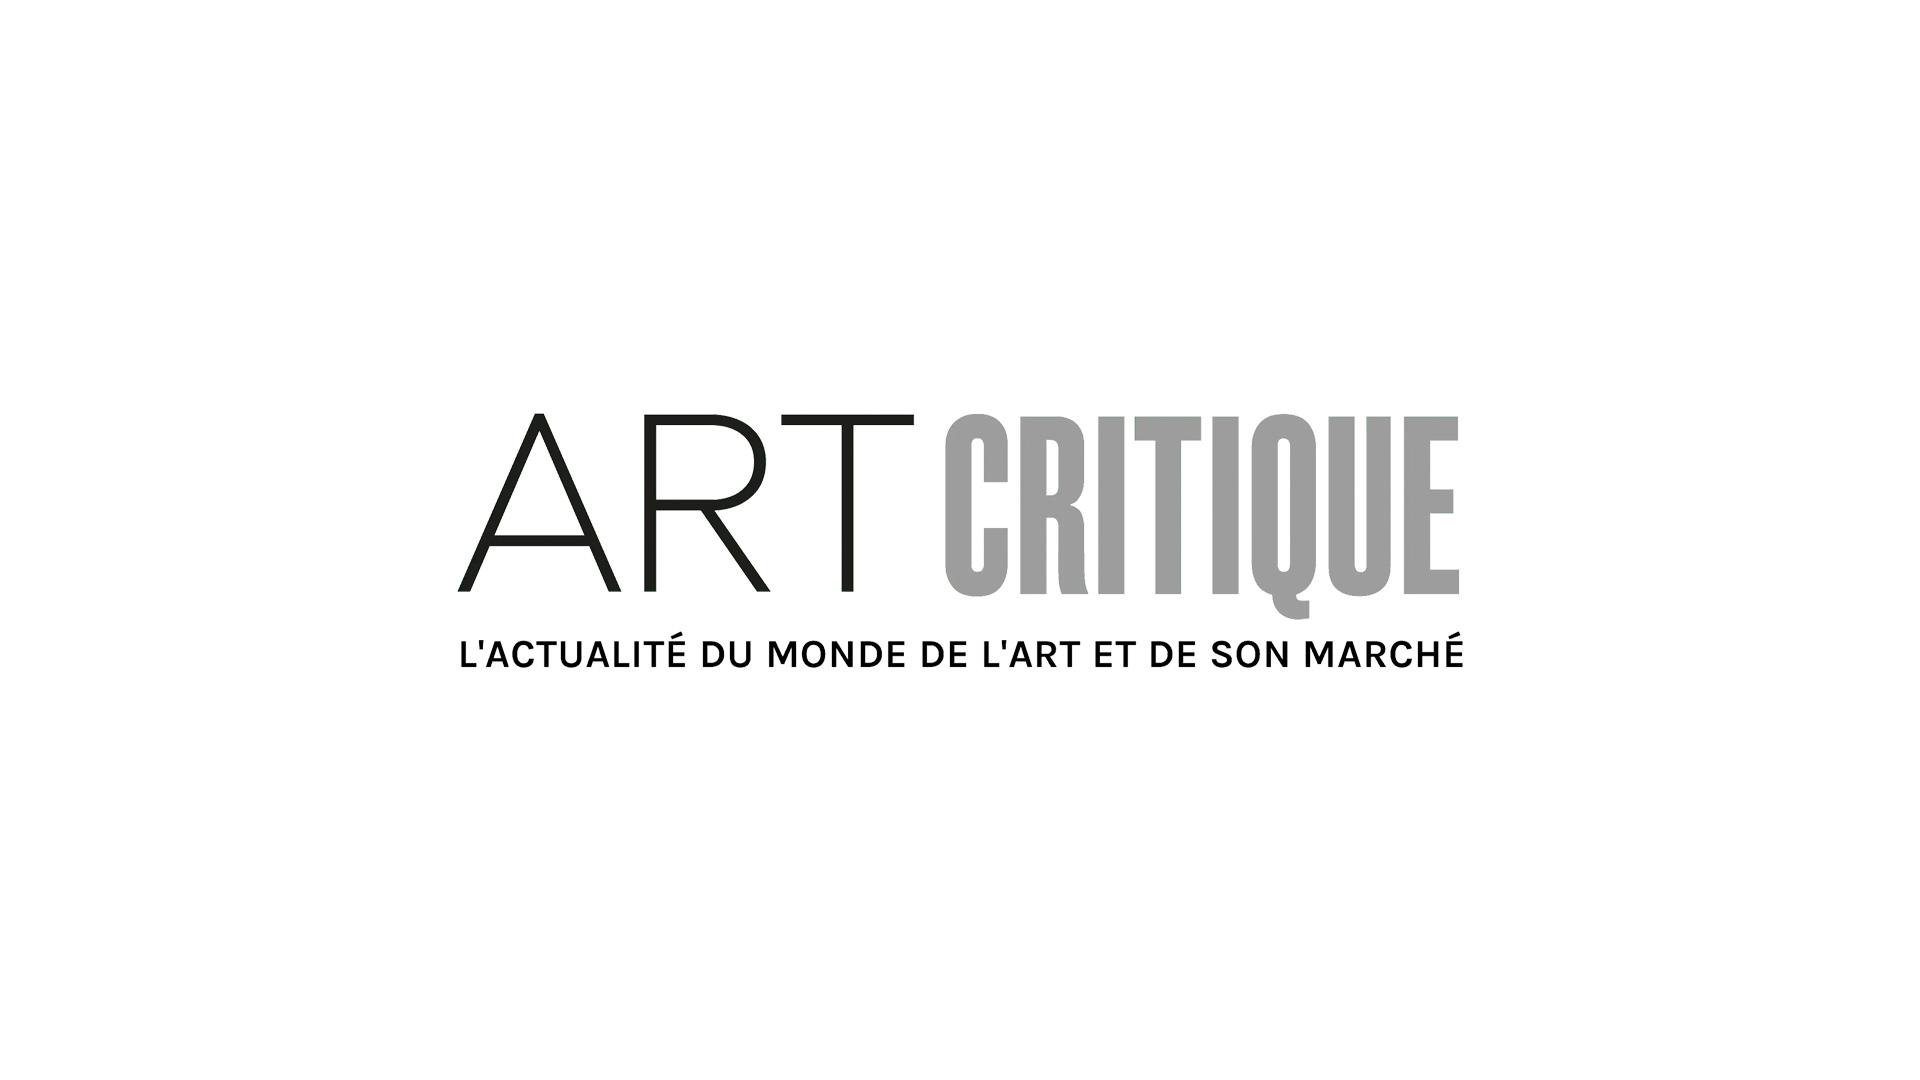 Louvre ditches Salvator Mundi over authenticity doubts